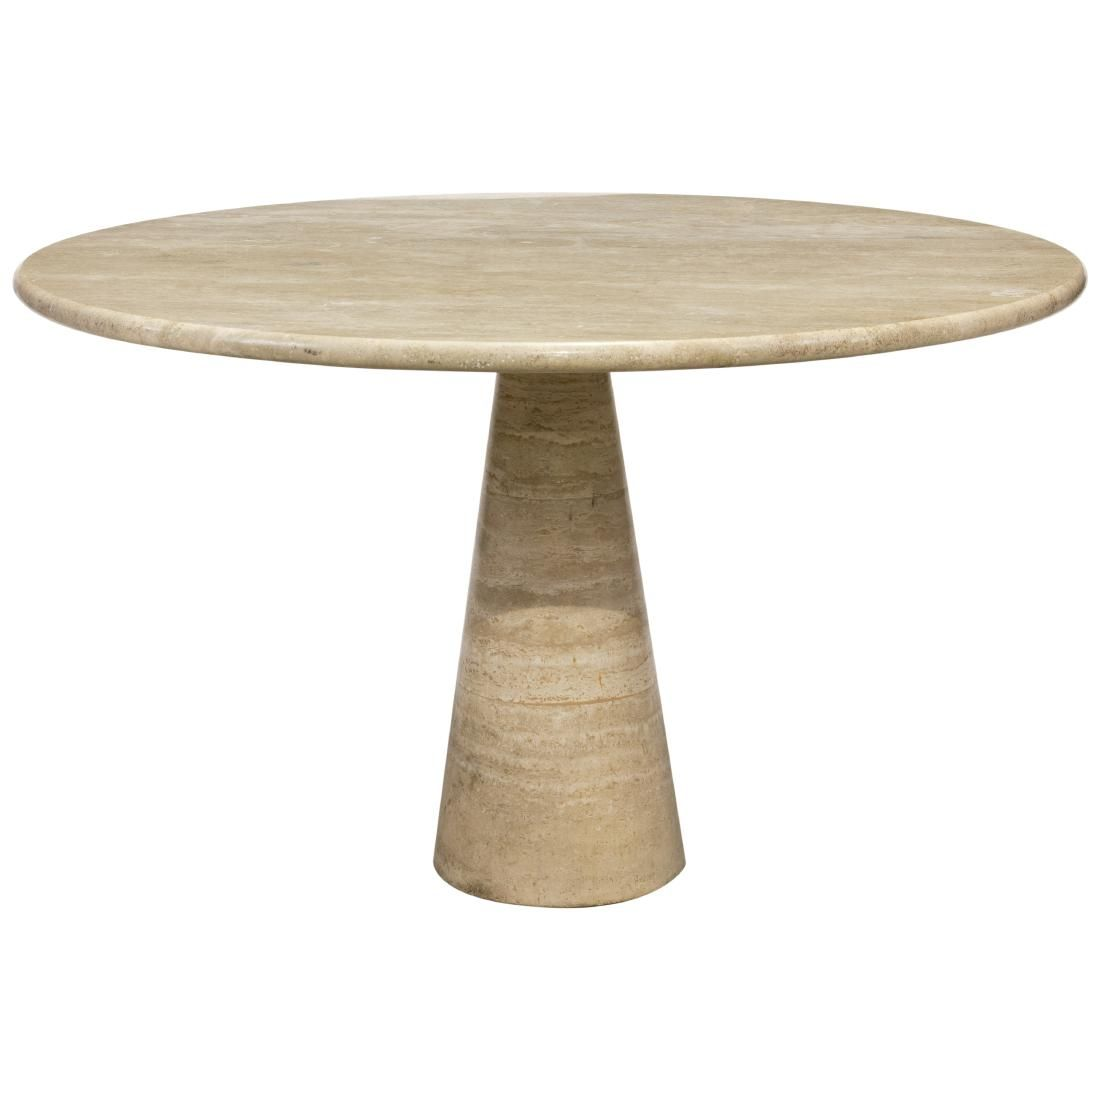 Angelo Mangiarotti (Attr.)- Travertine Marble Table